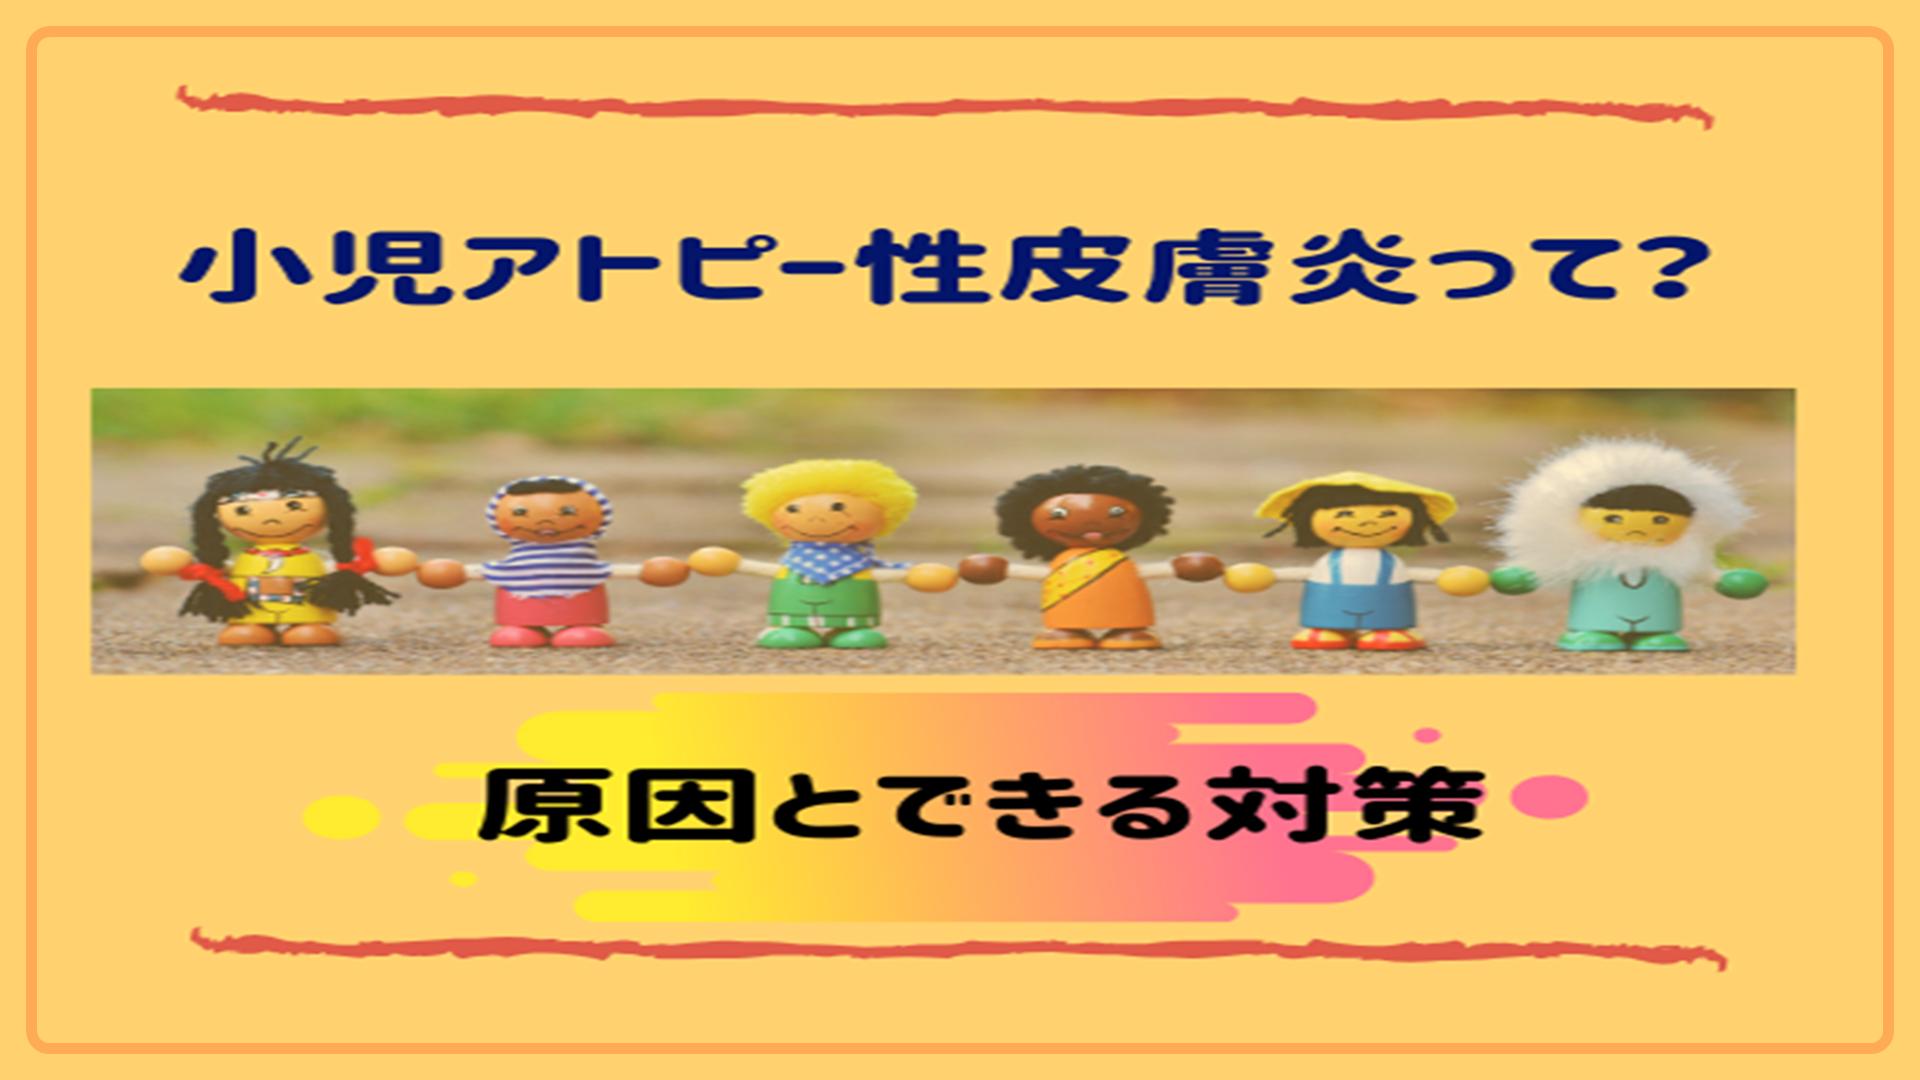 f:id:Chan-Kana:20200120143016p:plain